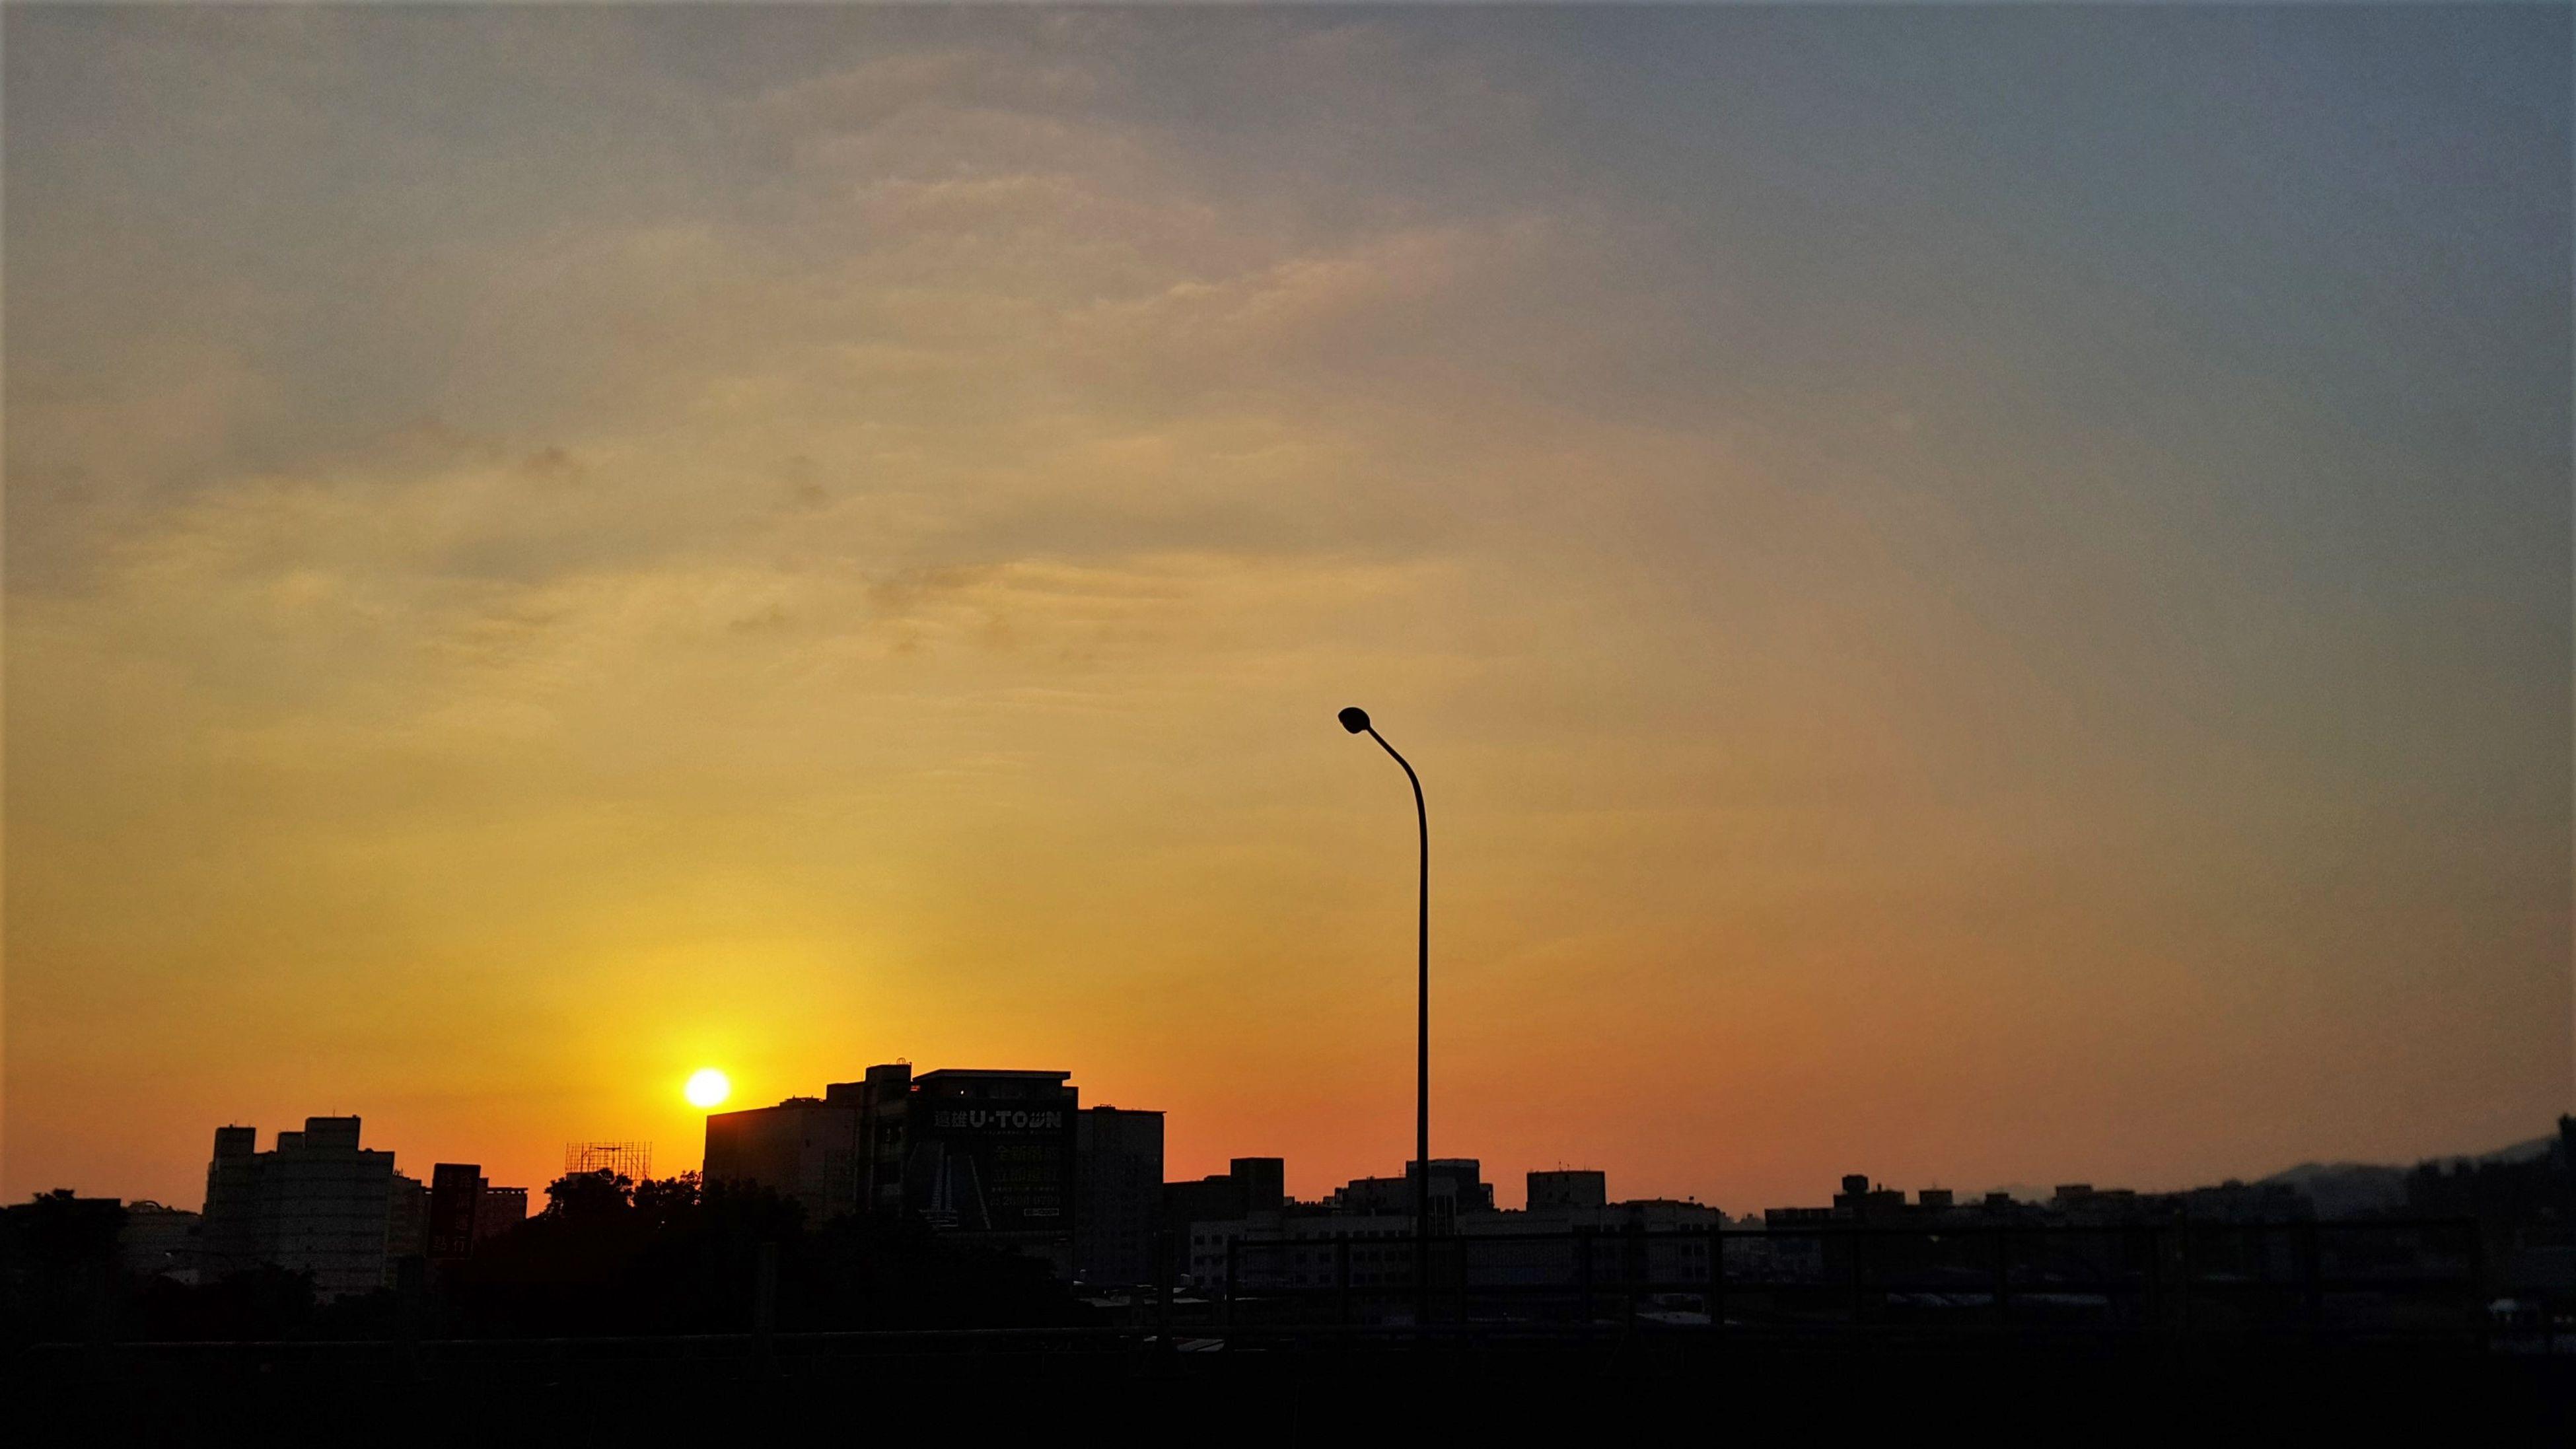 sunset, building exterior, silhouette, architecture, built structure, orange color, city, sun, sky, cityscape, skyscraper, building, cloud - sky, sunlight, urban skyline, tower, outdoors, residential building, scenics, beauty in nature